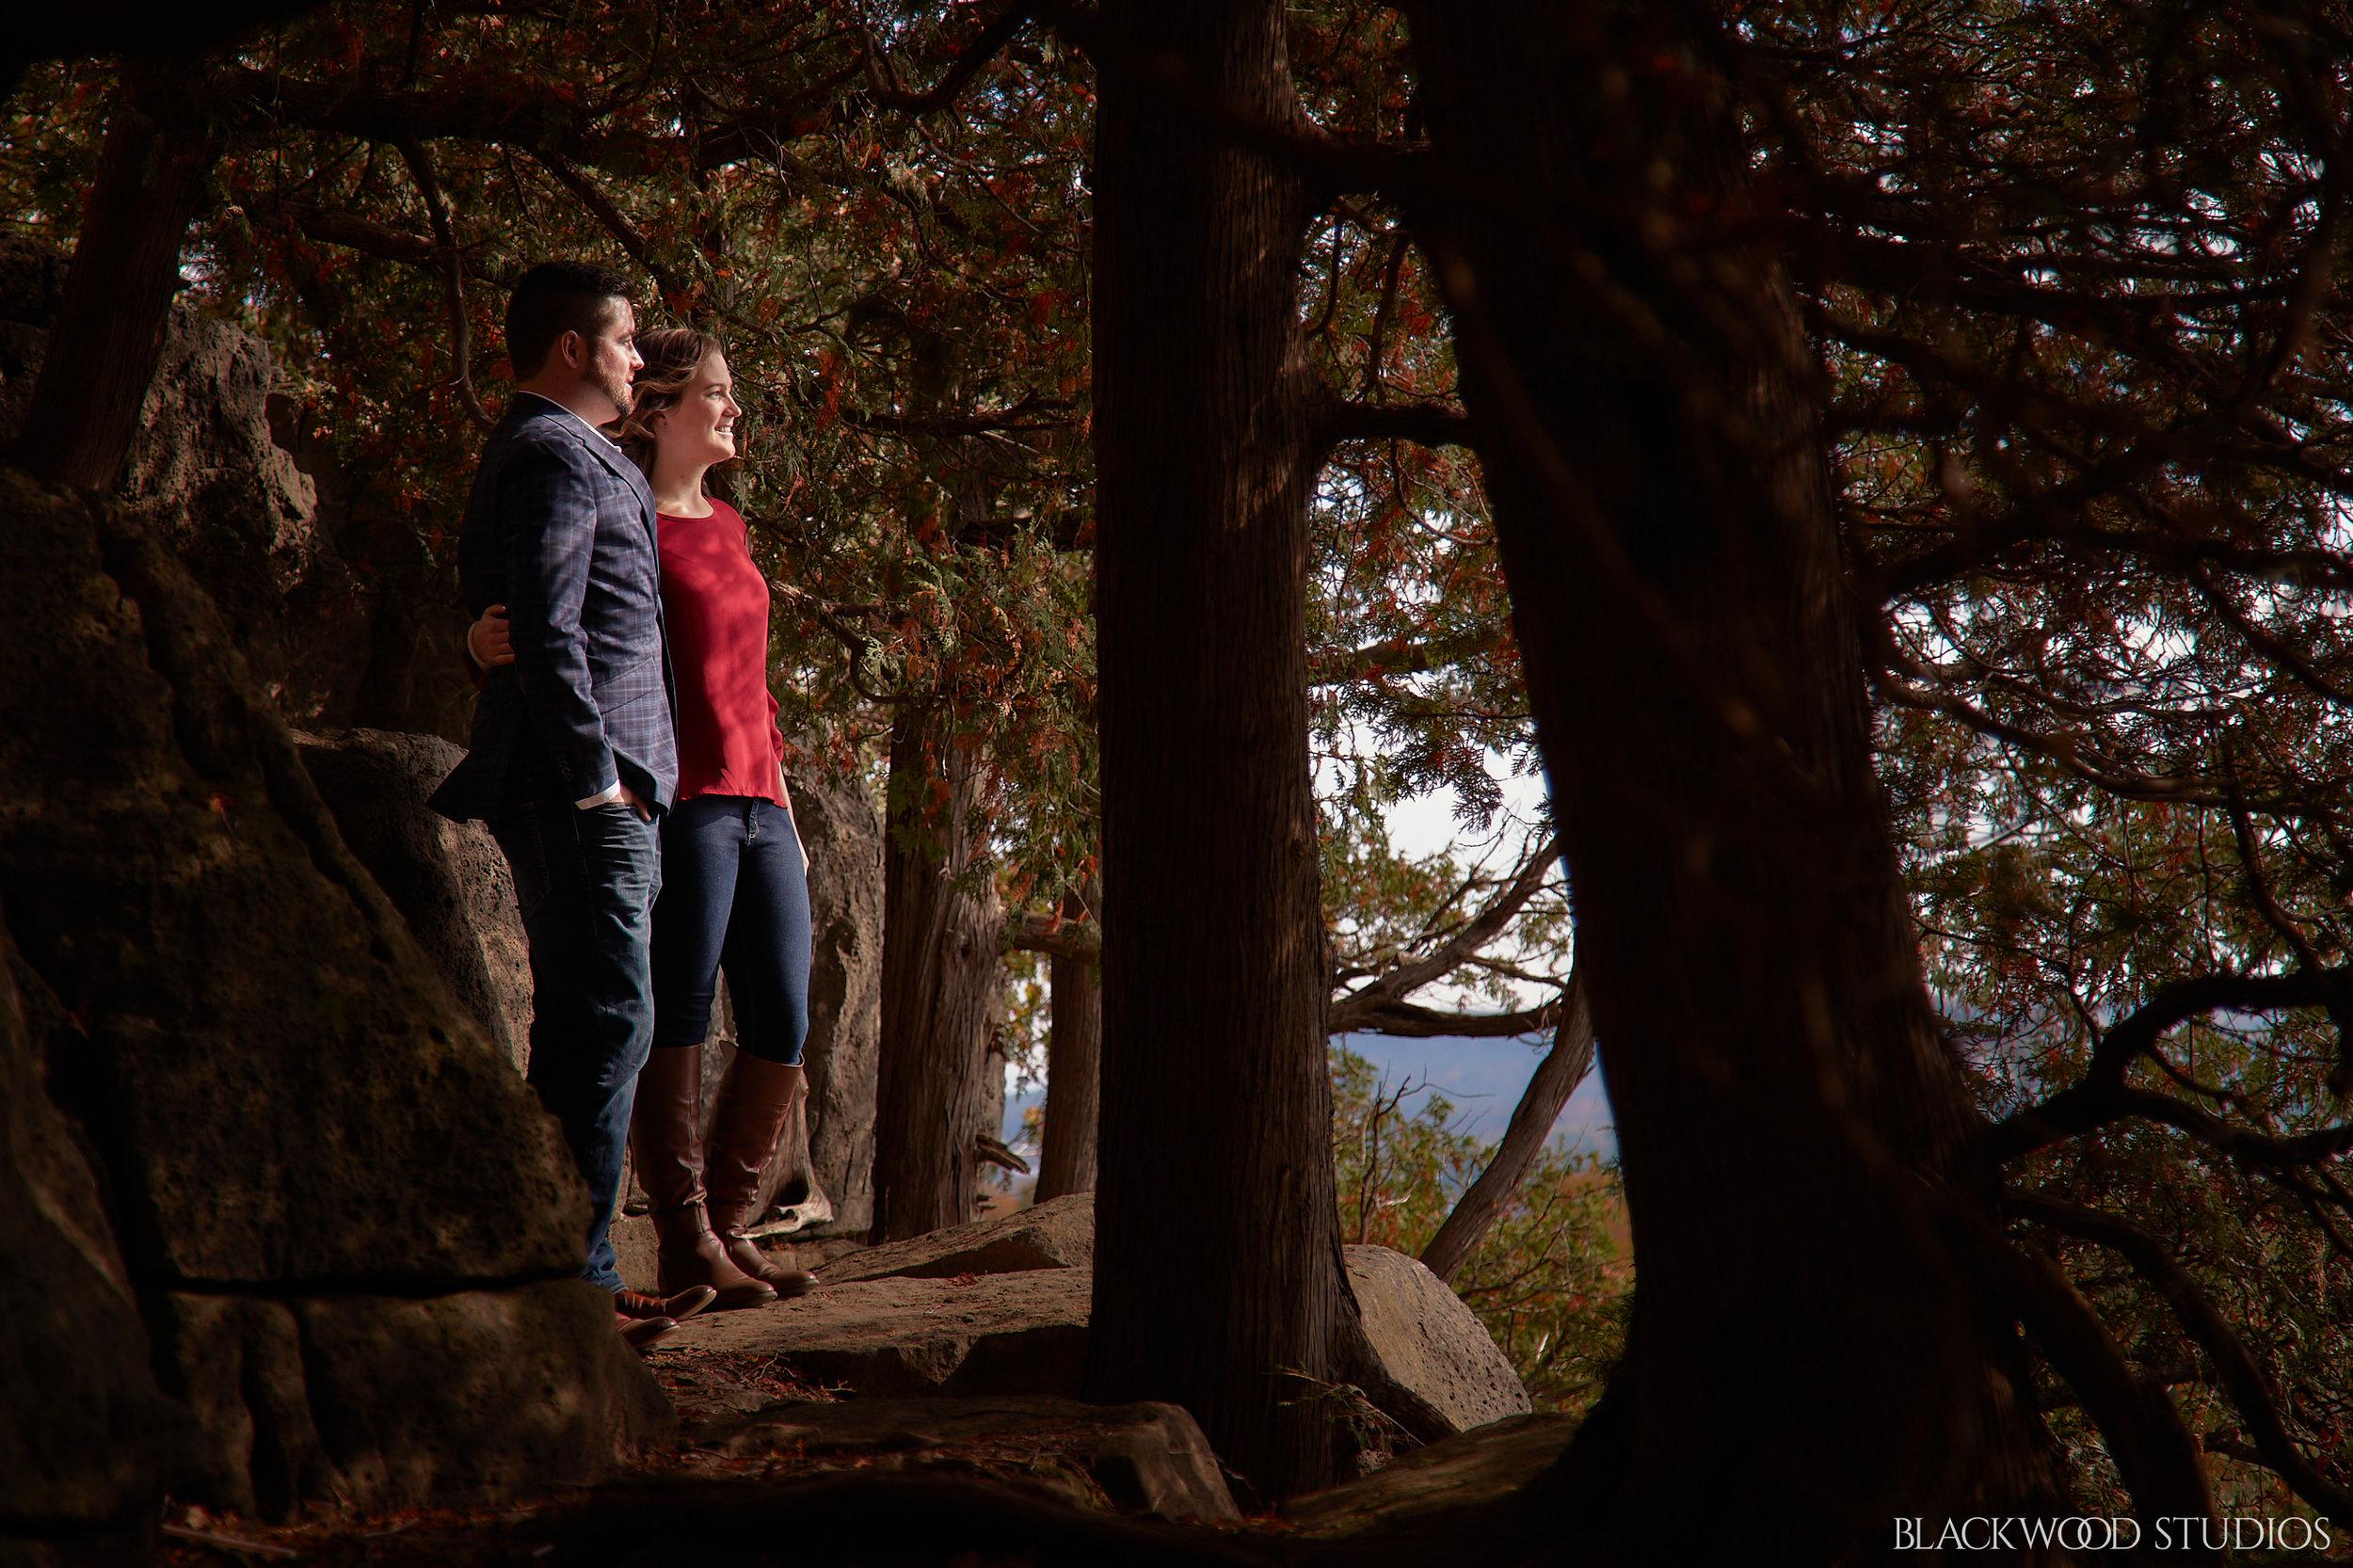 Blackwood-Studios-20181014-145628-Dave-and-Natalie-Engagement-0017-Rattlesnake-Point-Conservation-Area-Milton-Ontario.jpg